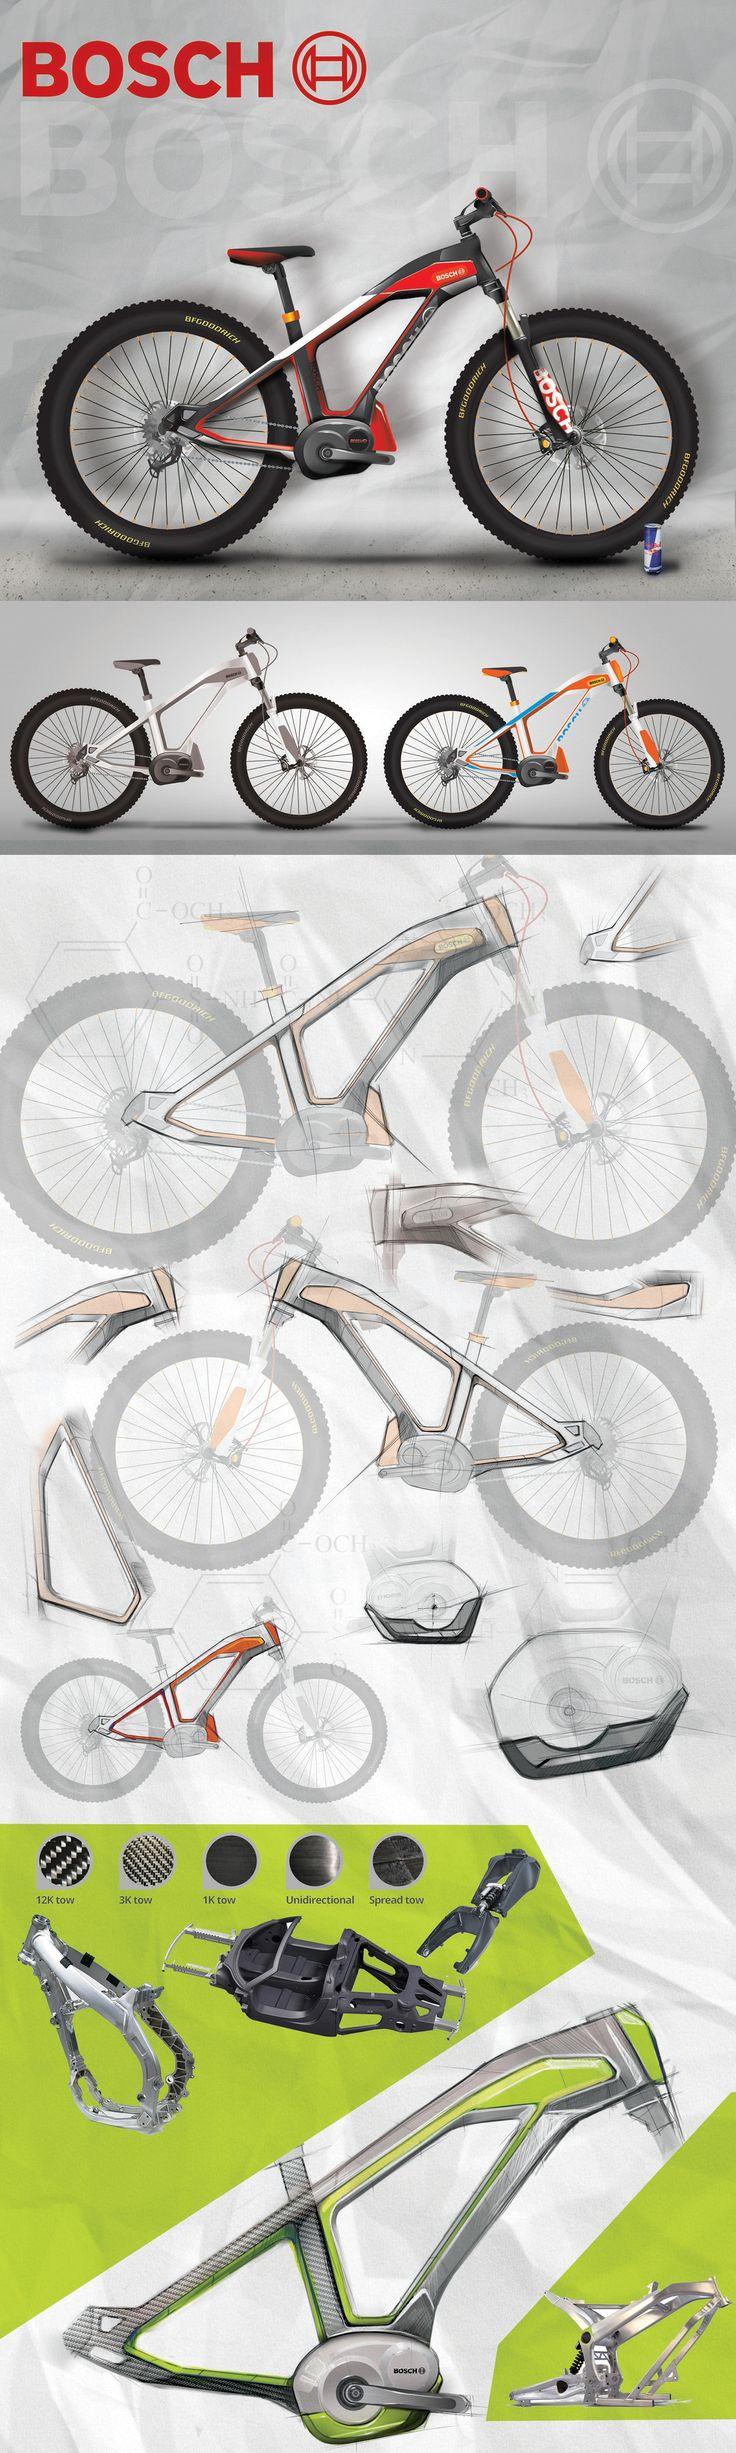 E-bike BOSCH on Behance